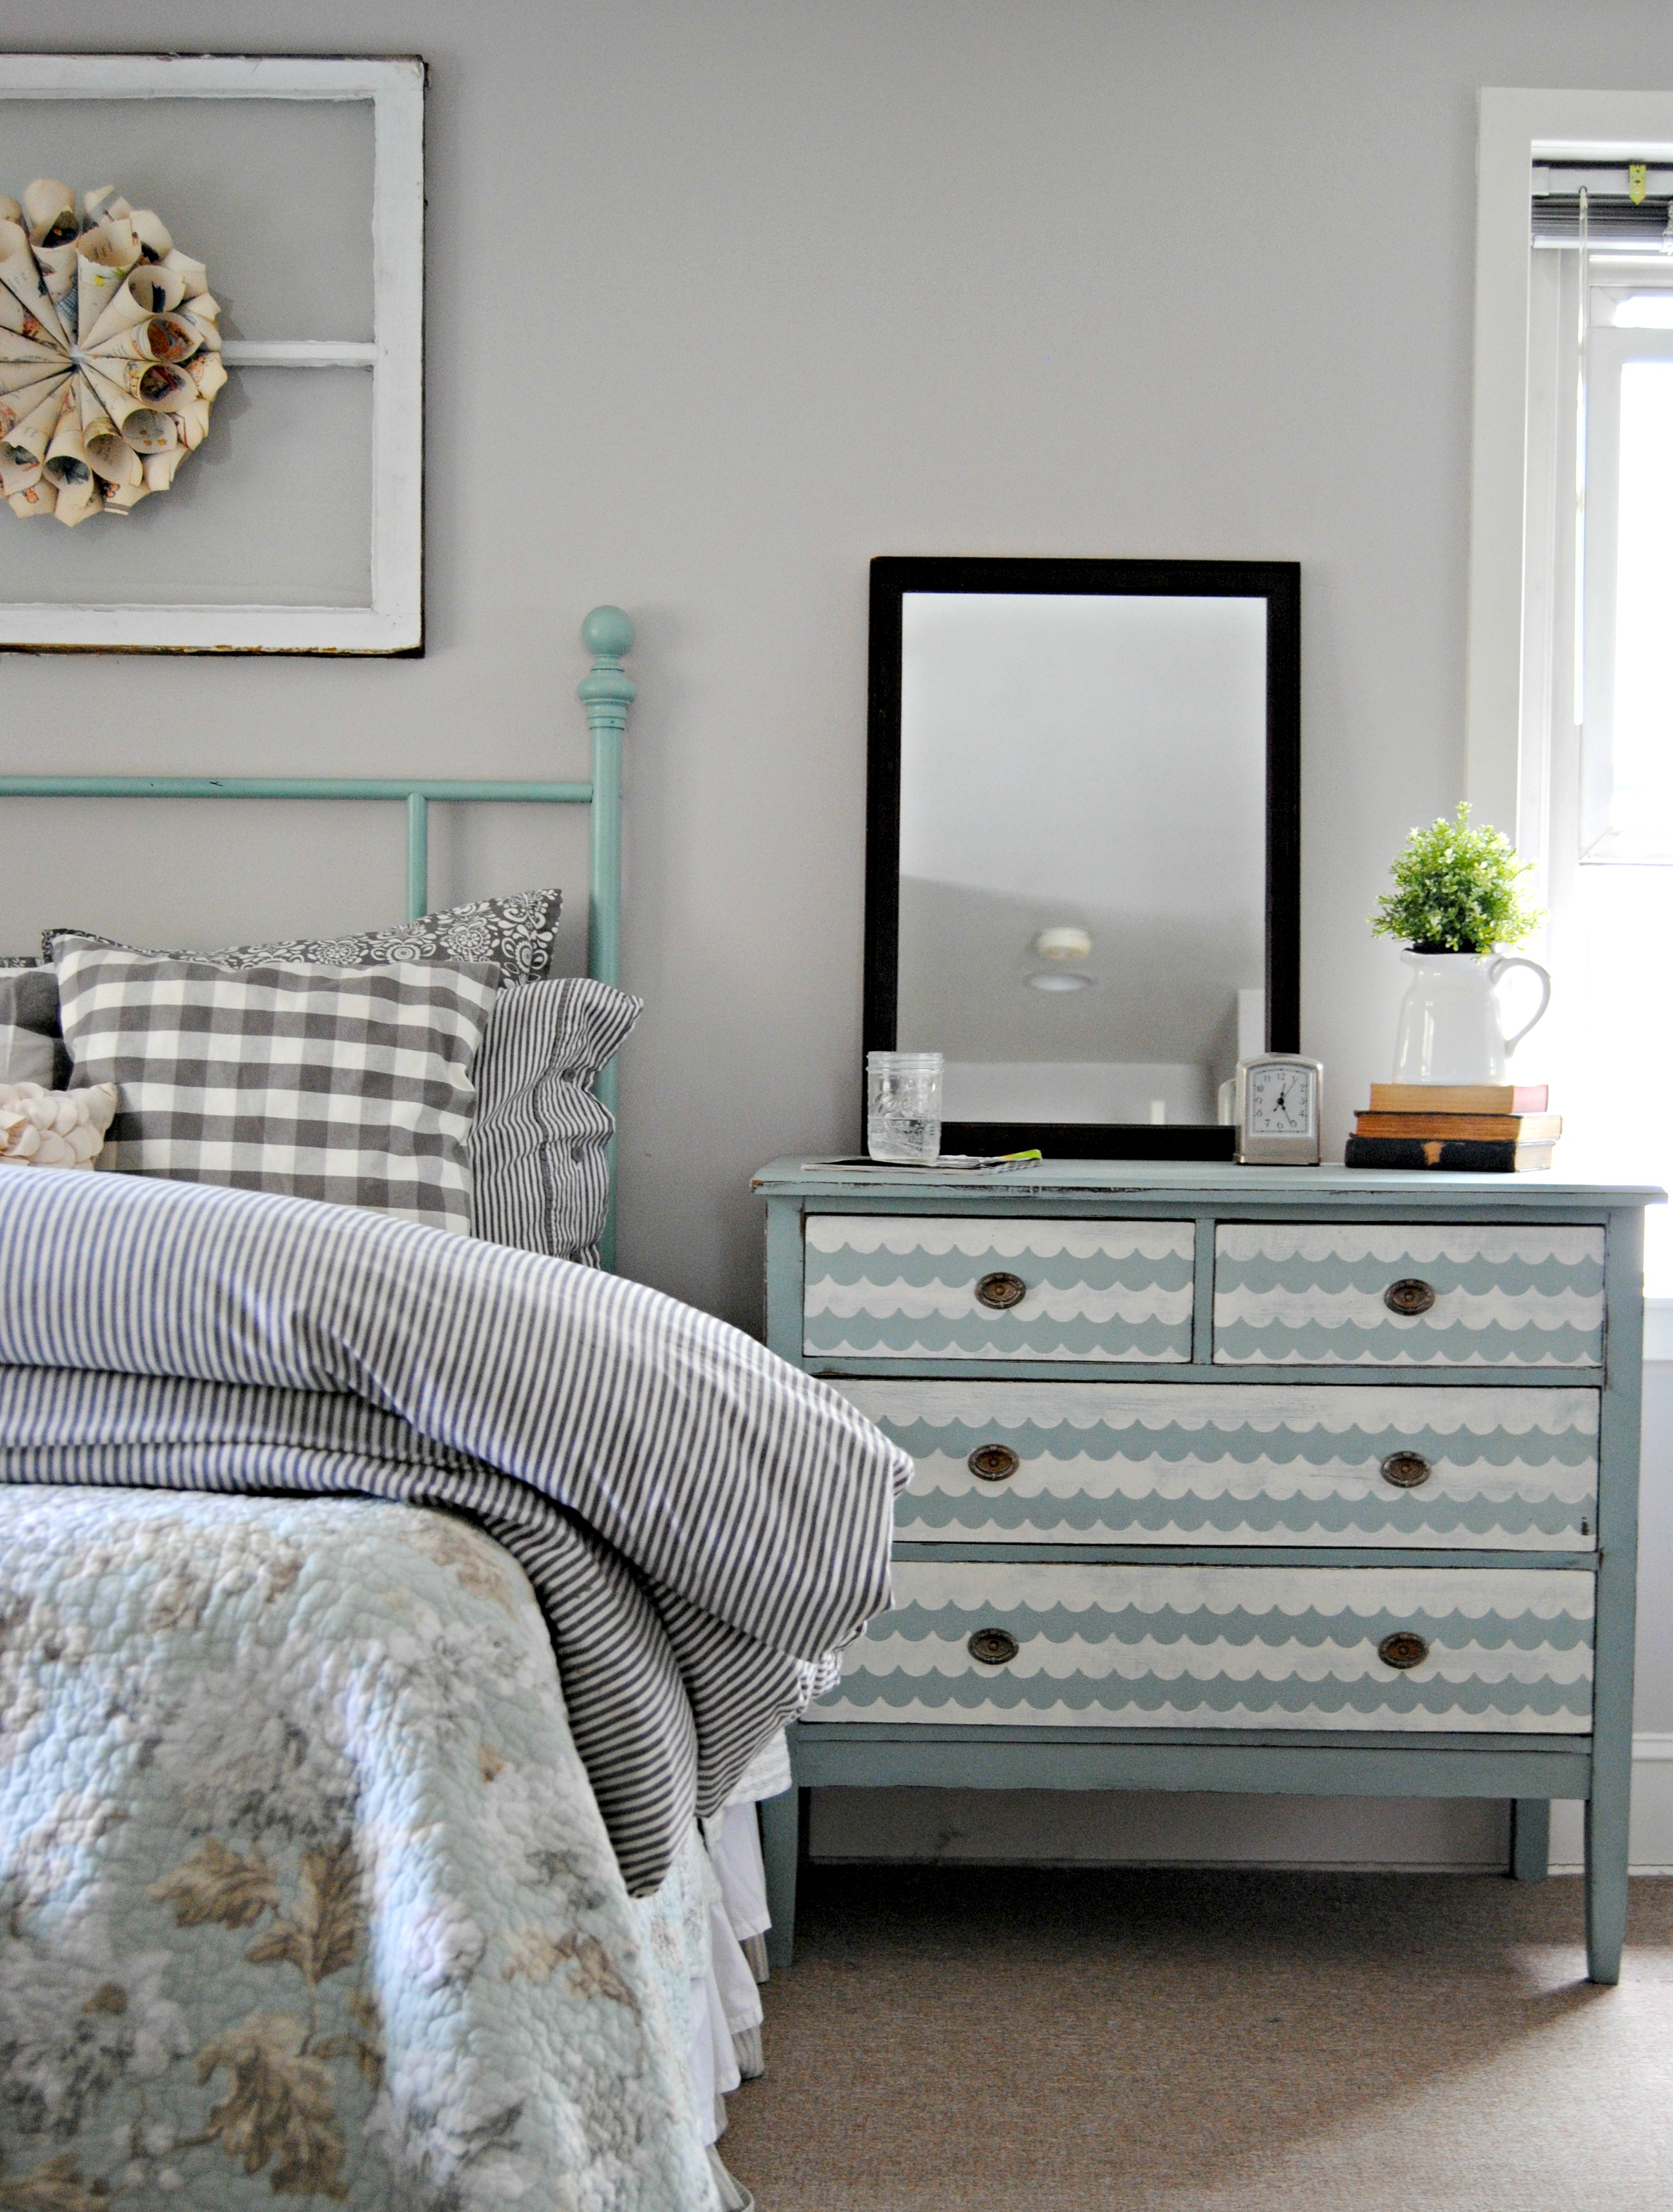 Cheap Design Ideas — Bedroom Decorating Ideas on Cheap Bedroom Ideas  id=59490